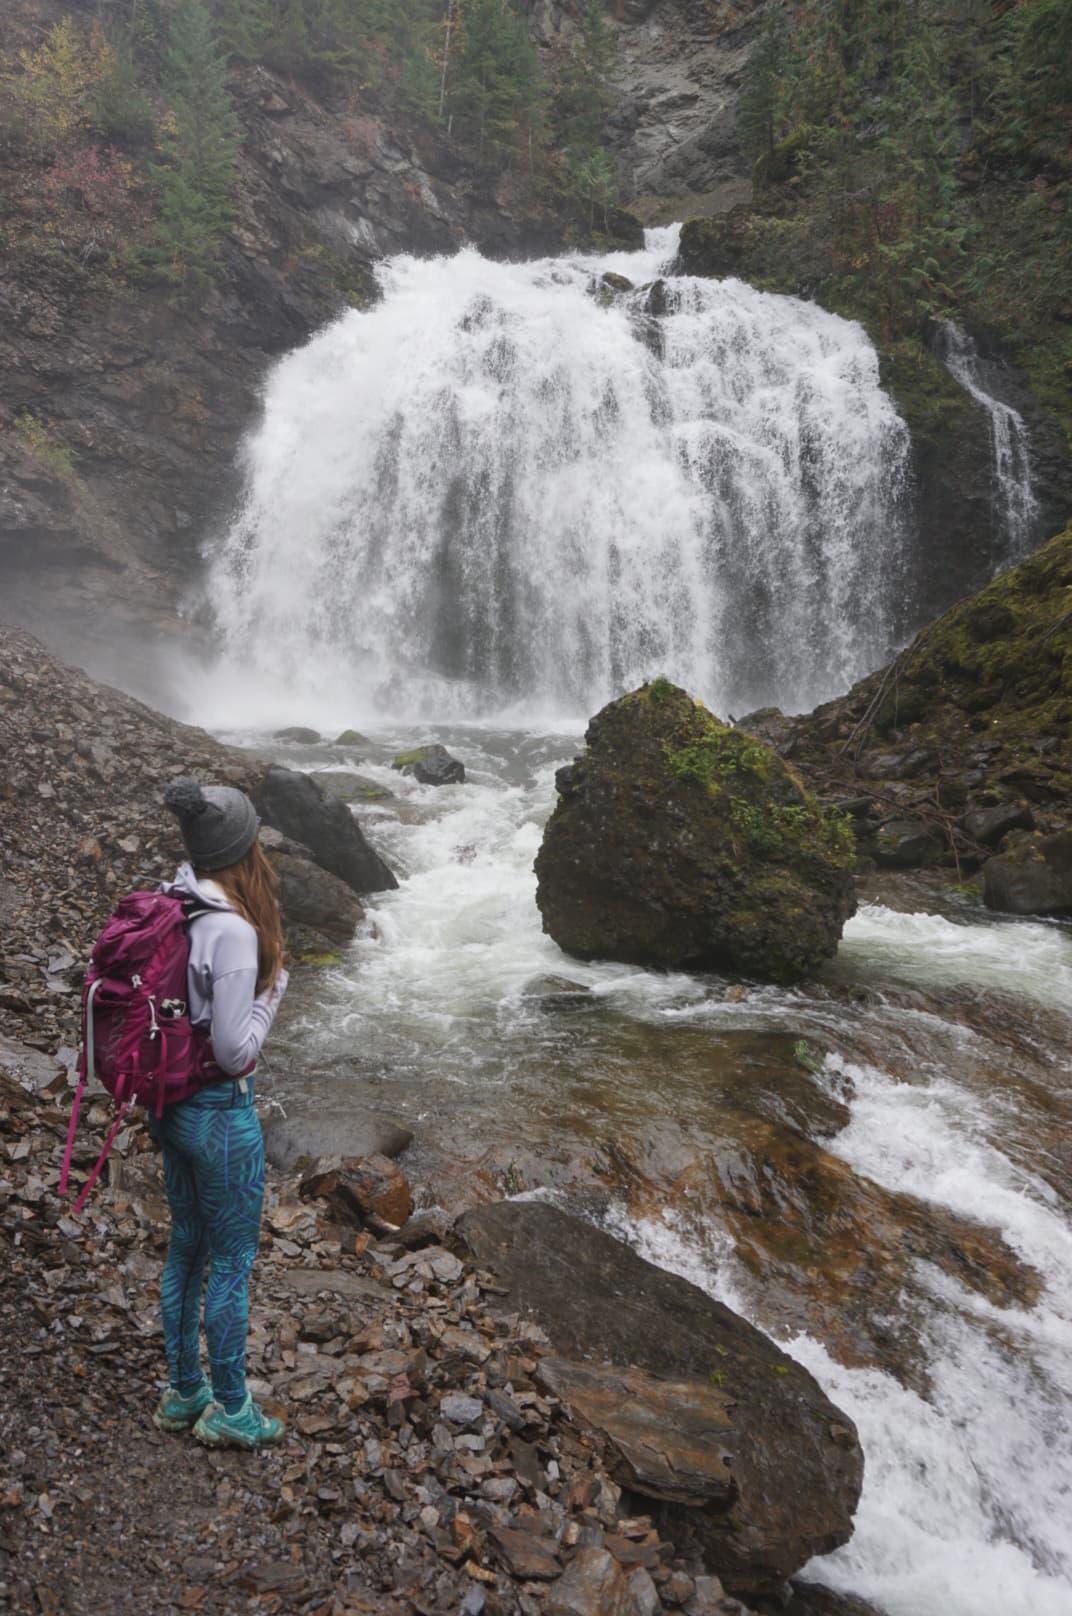 Corry Bondini enjoying the extra effort it takes to reach McDiramid Falls